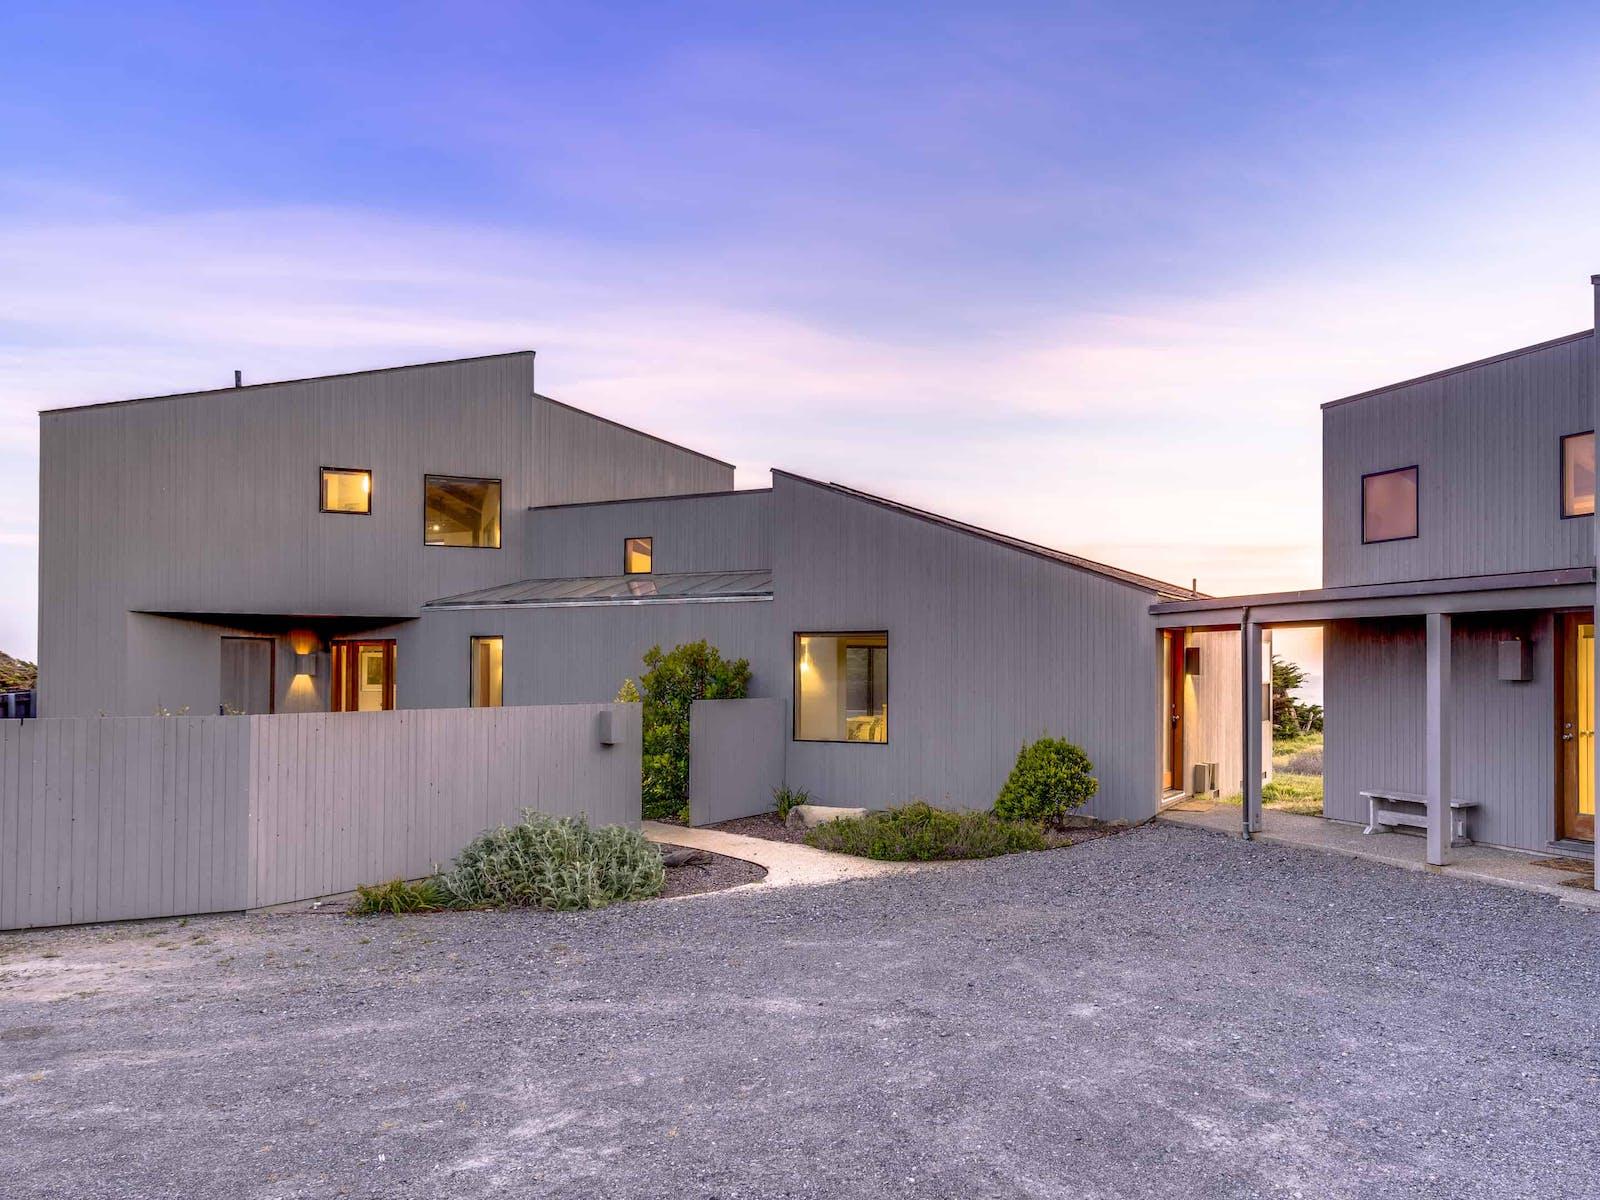 Beach house in Sea Ranch, CA with unique architecture